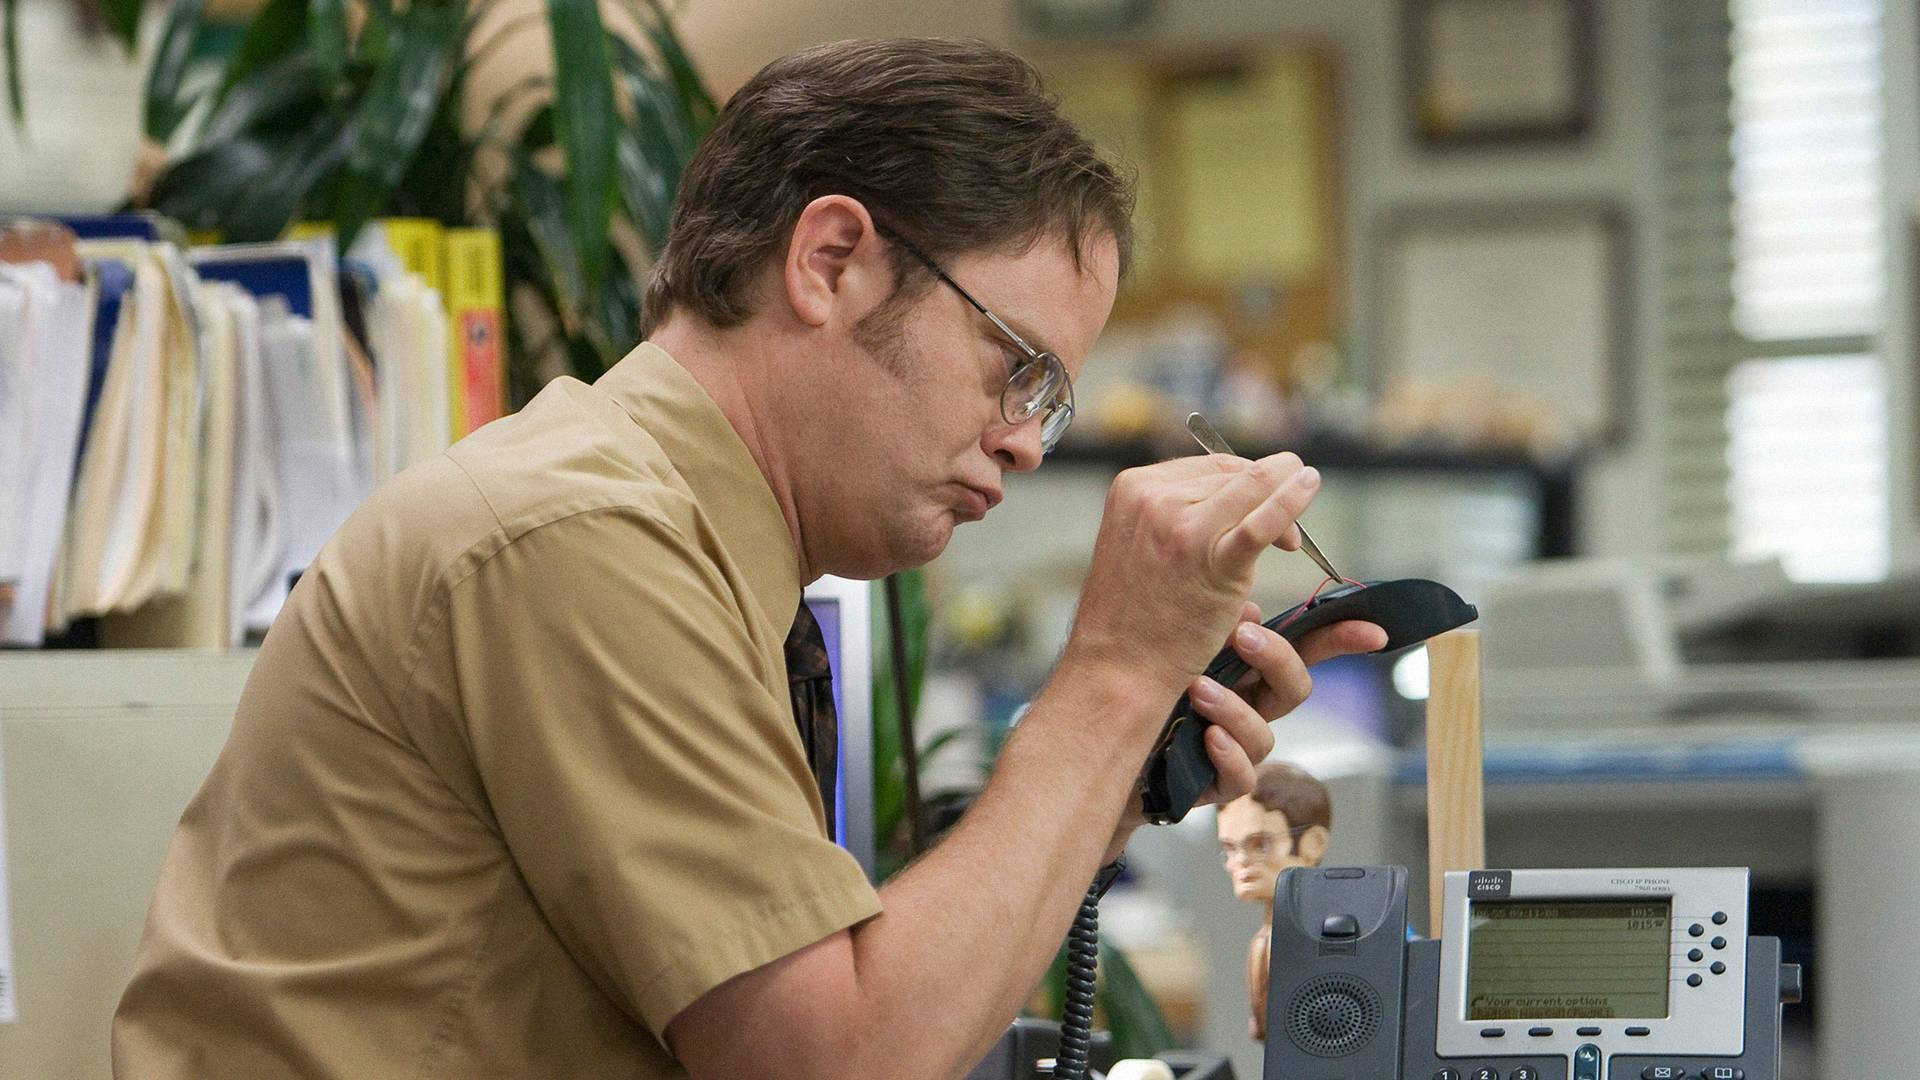 The Office Season 5 Episode 7